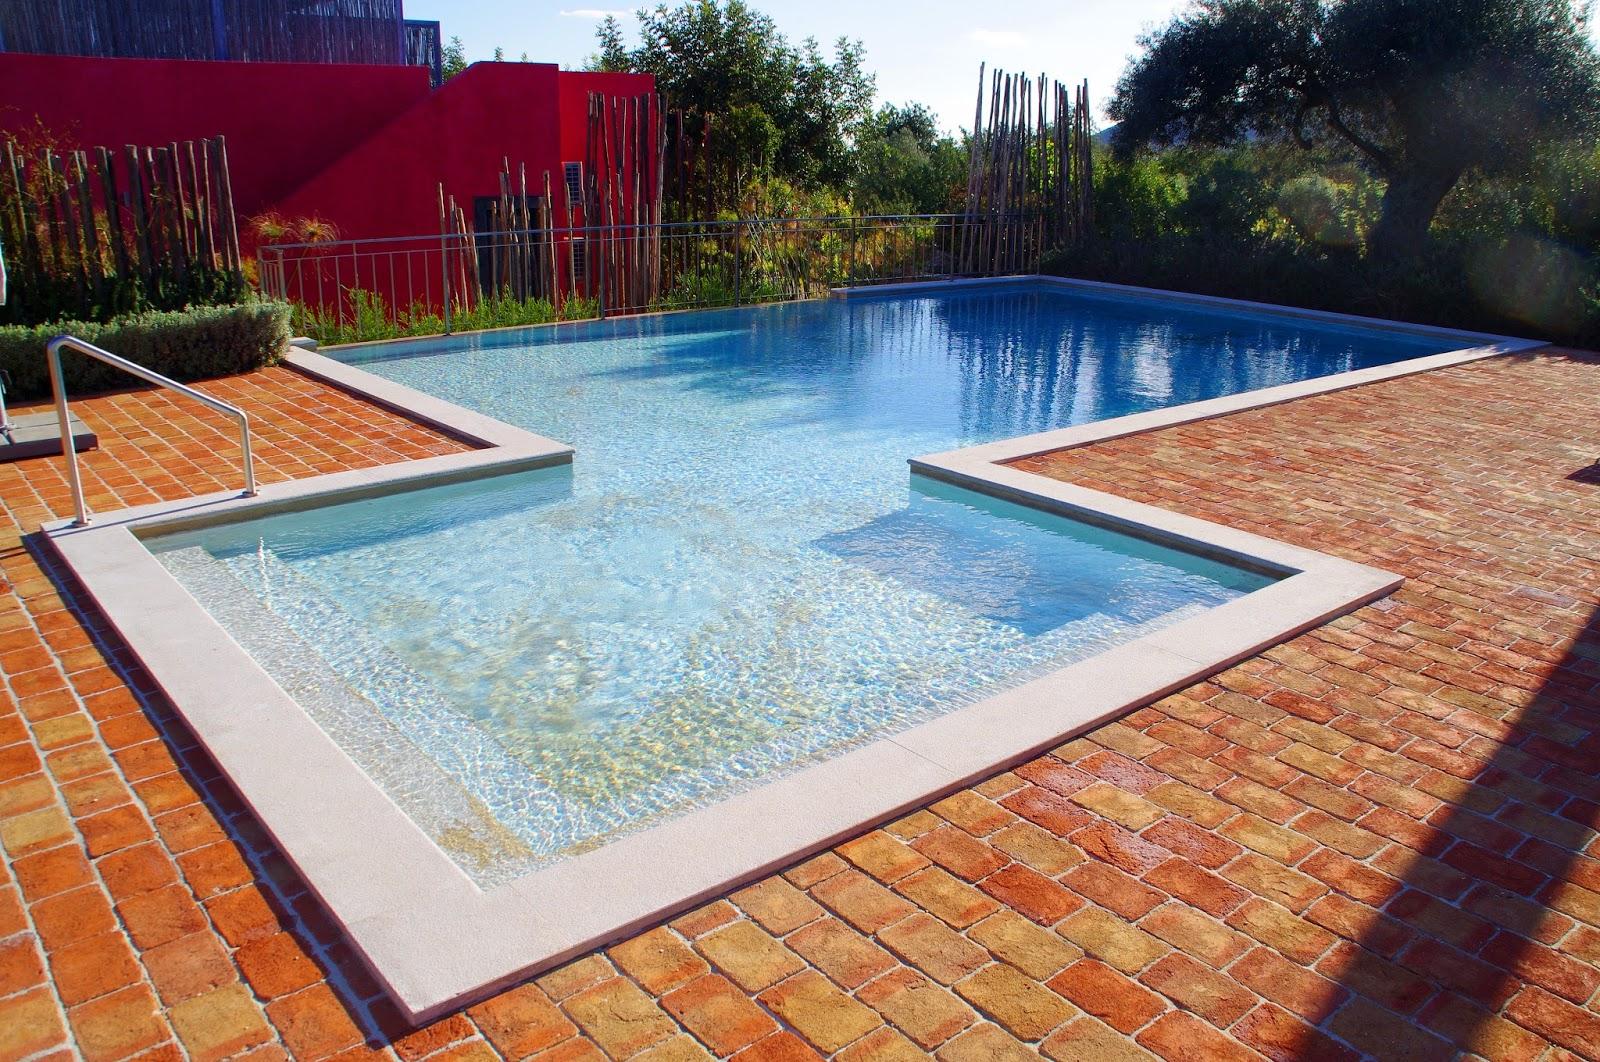 Fazenda Nova Country House Pool